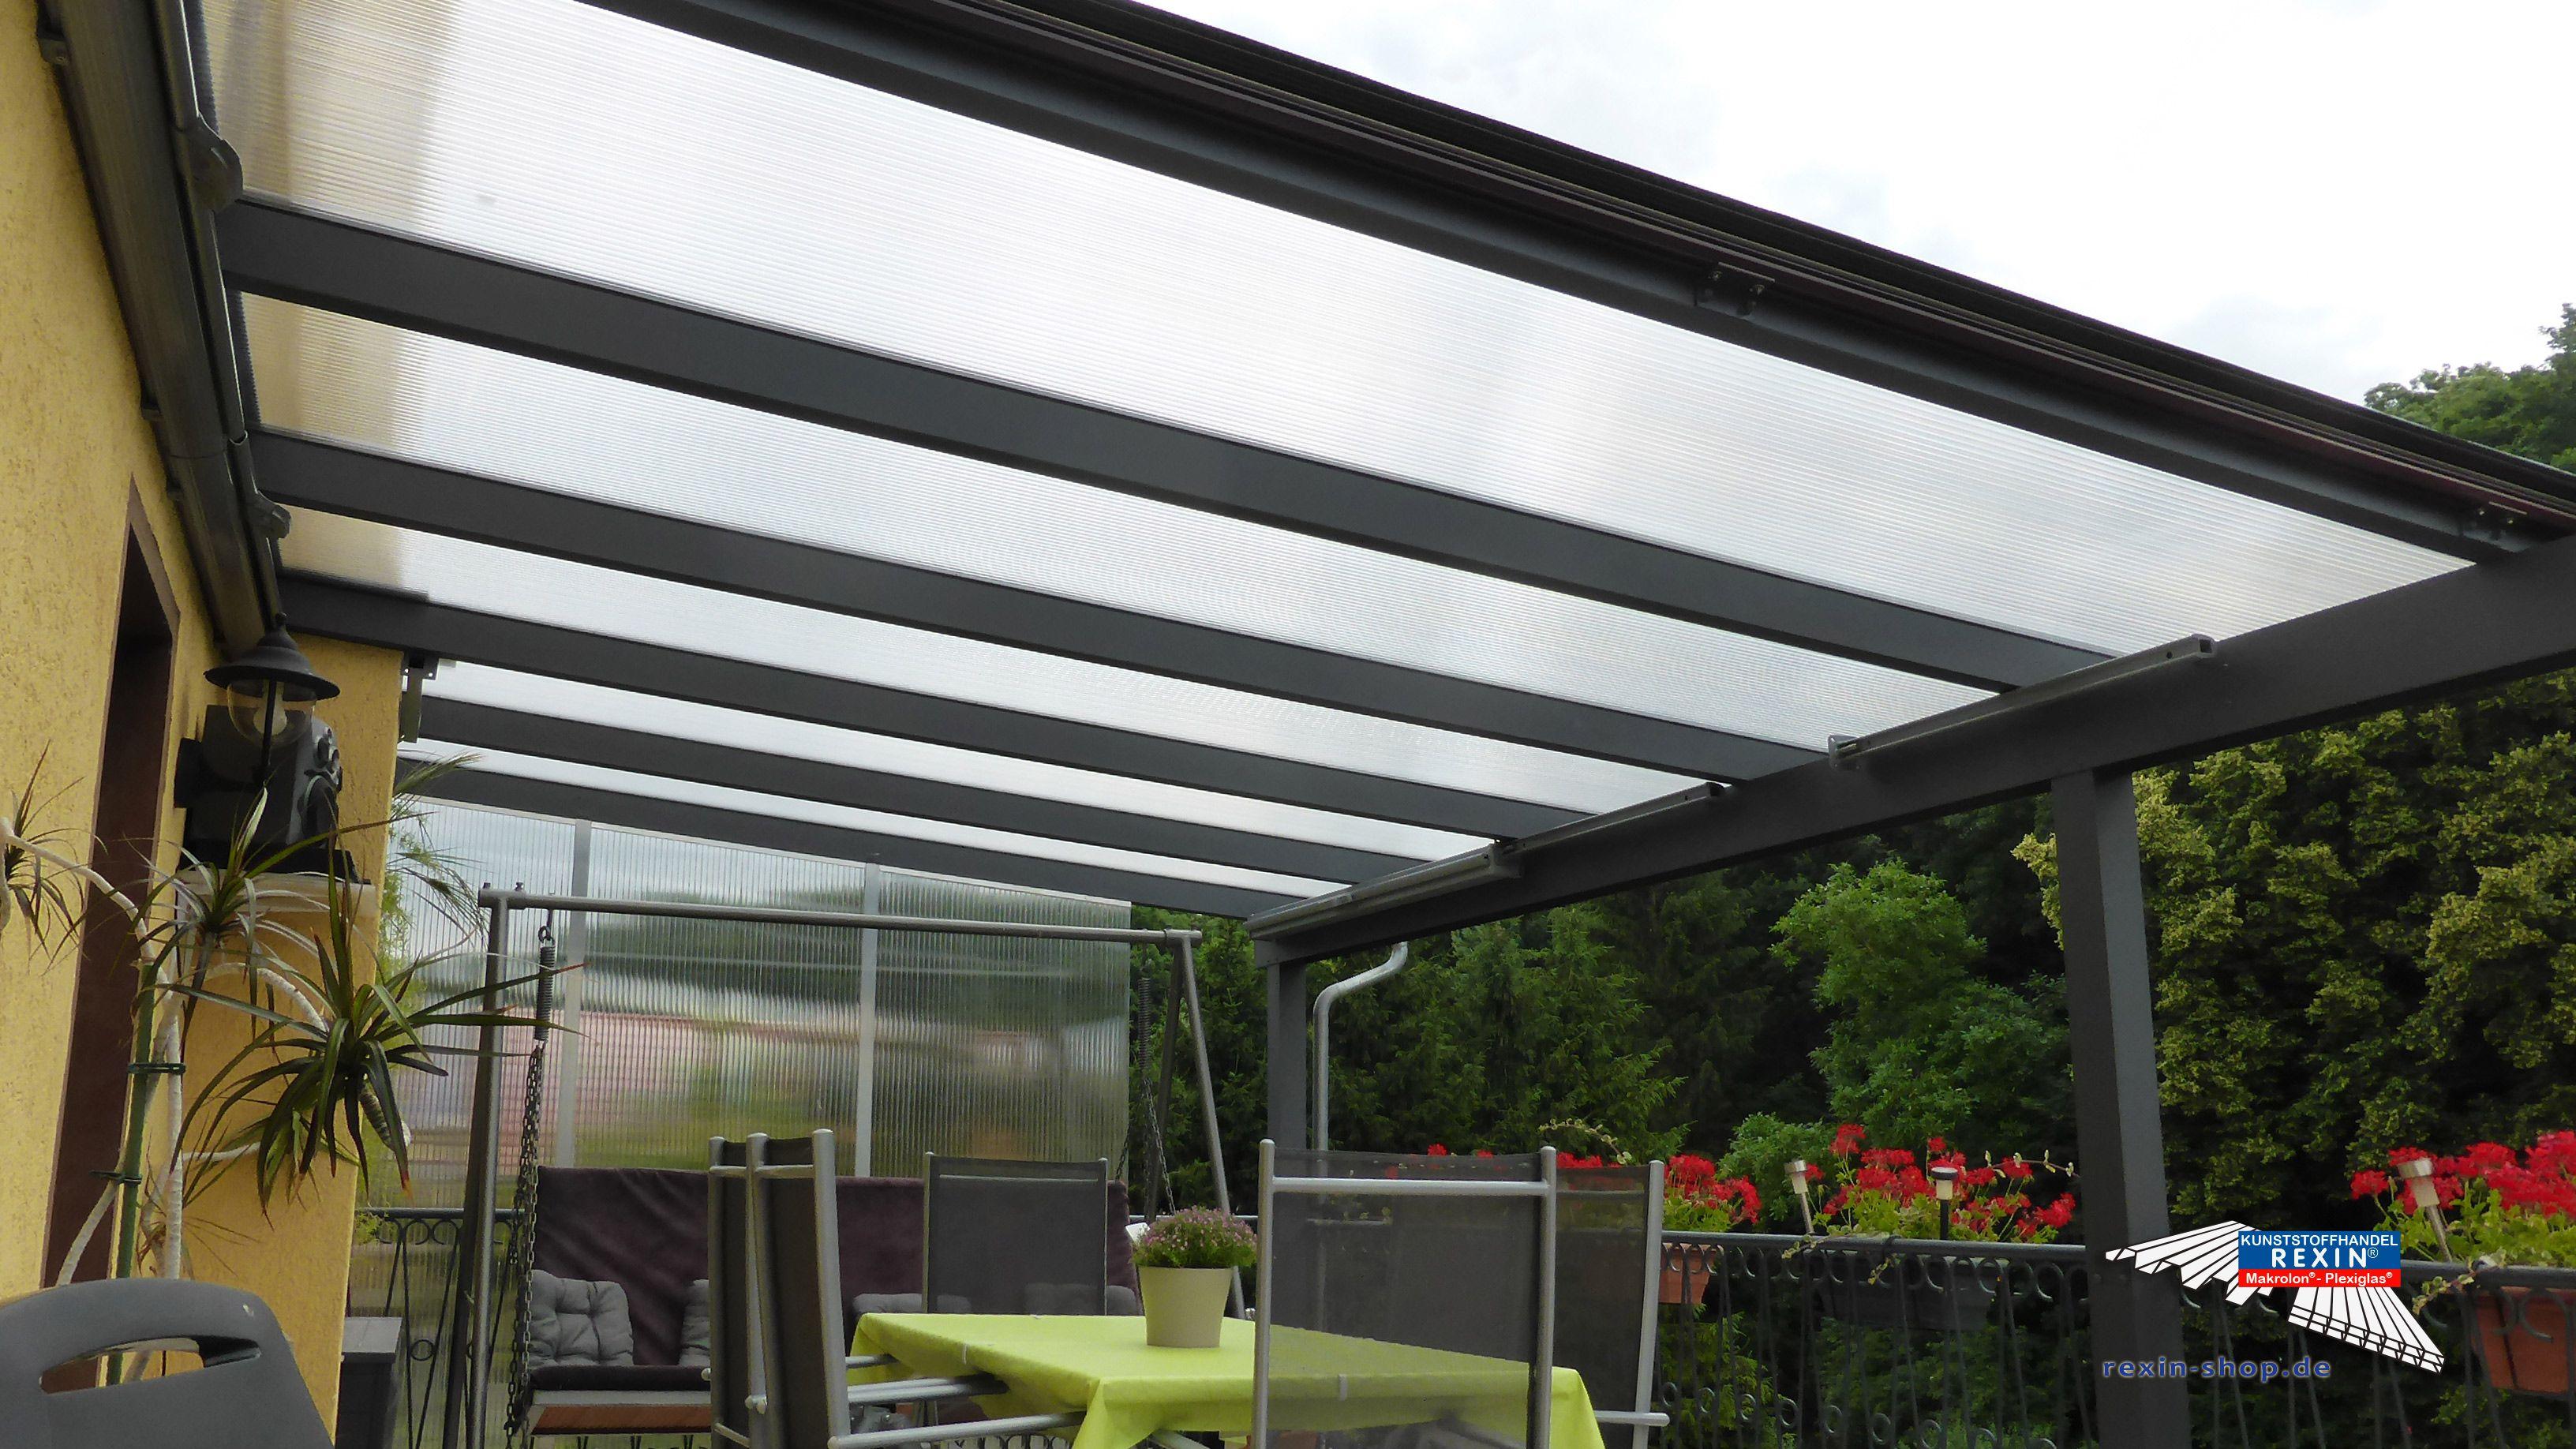 d7210ea218f03f1e85bb1a5f3e7d3fc1 Inspiration Sichtschutz Balkon Einseitig Durchsichtig Schema